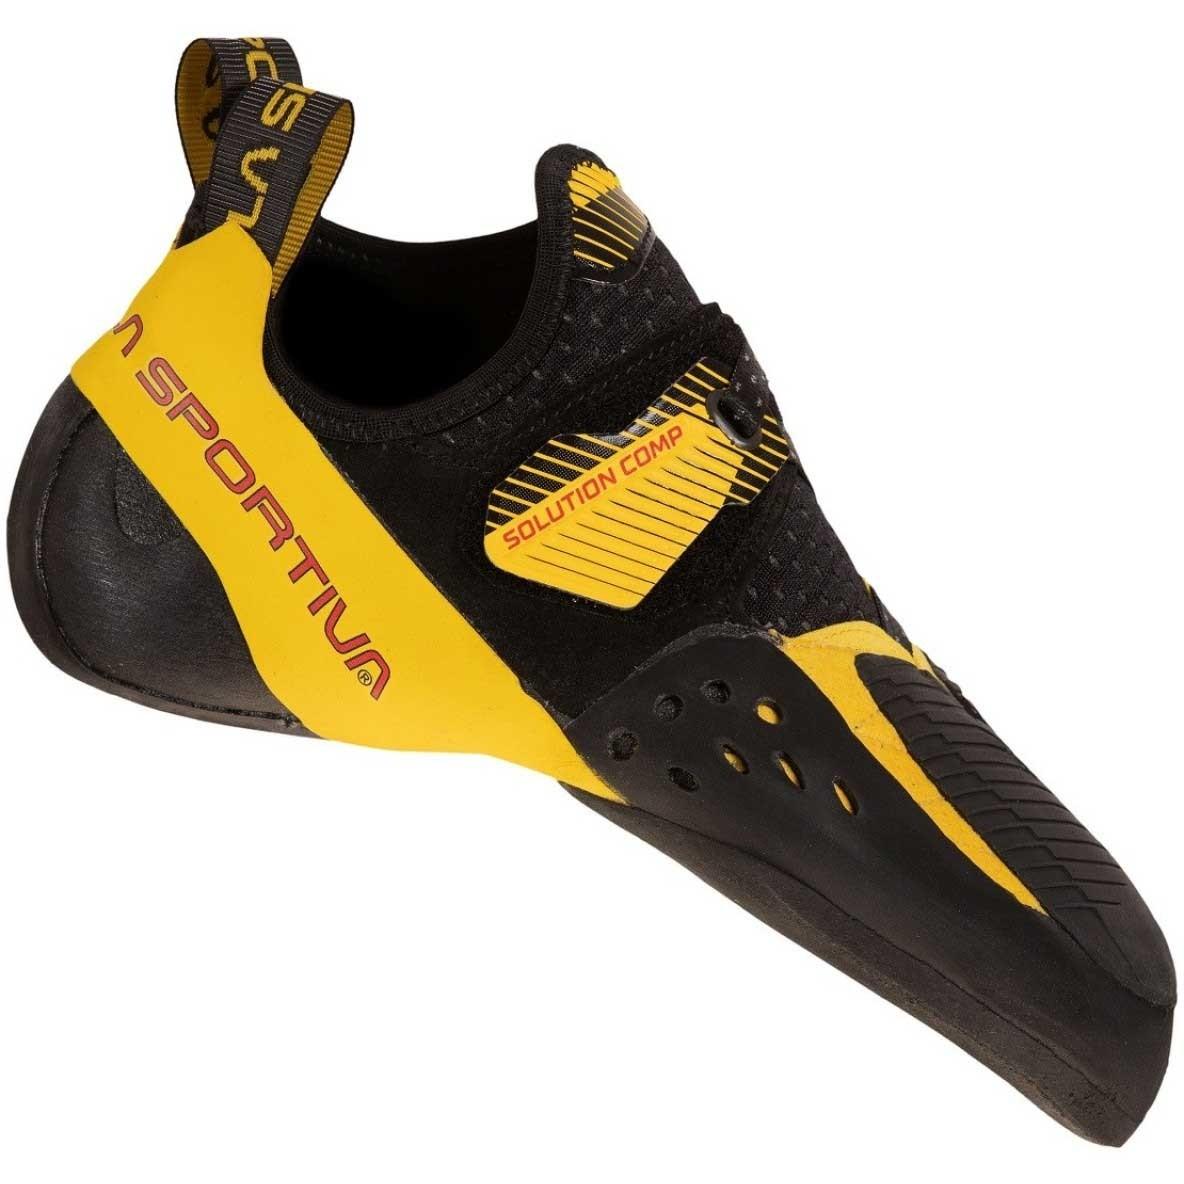 La Sportiva Solution Comp Climbing Shoe - Men's - Black/Yellow